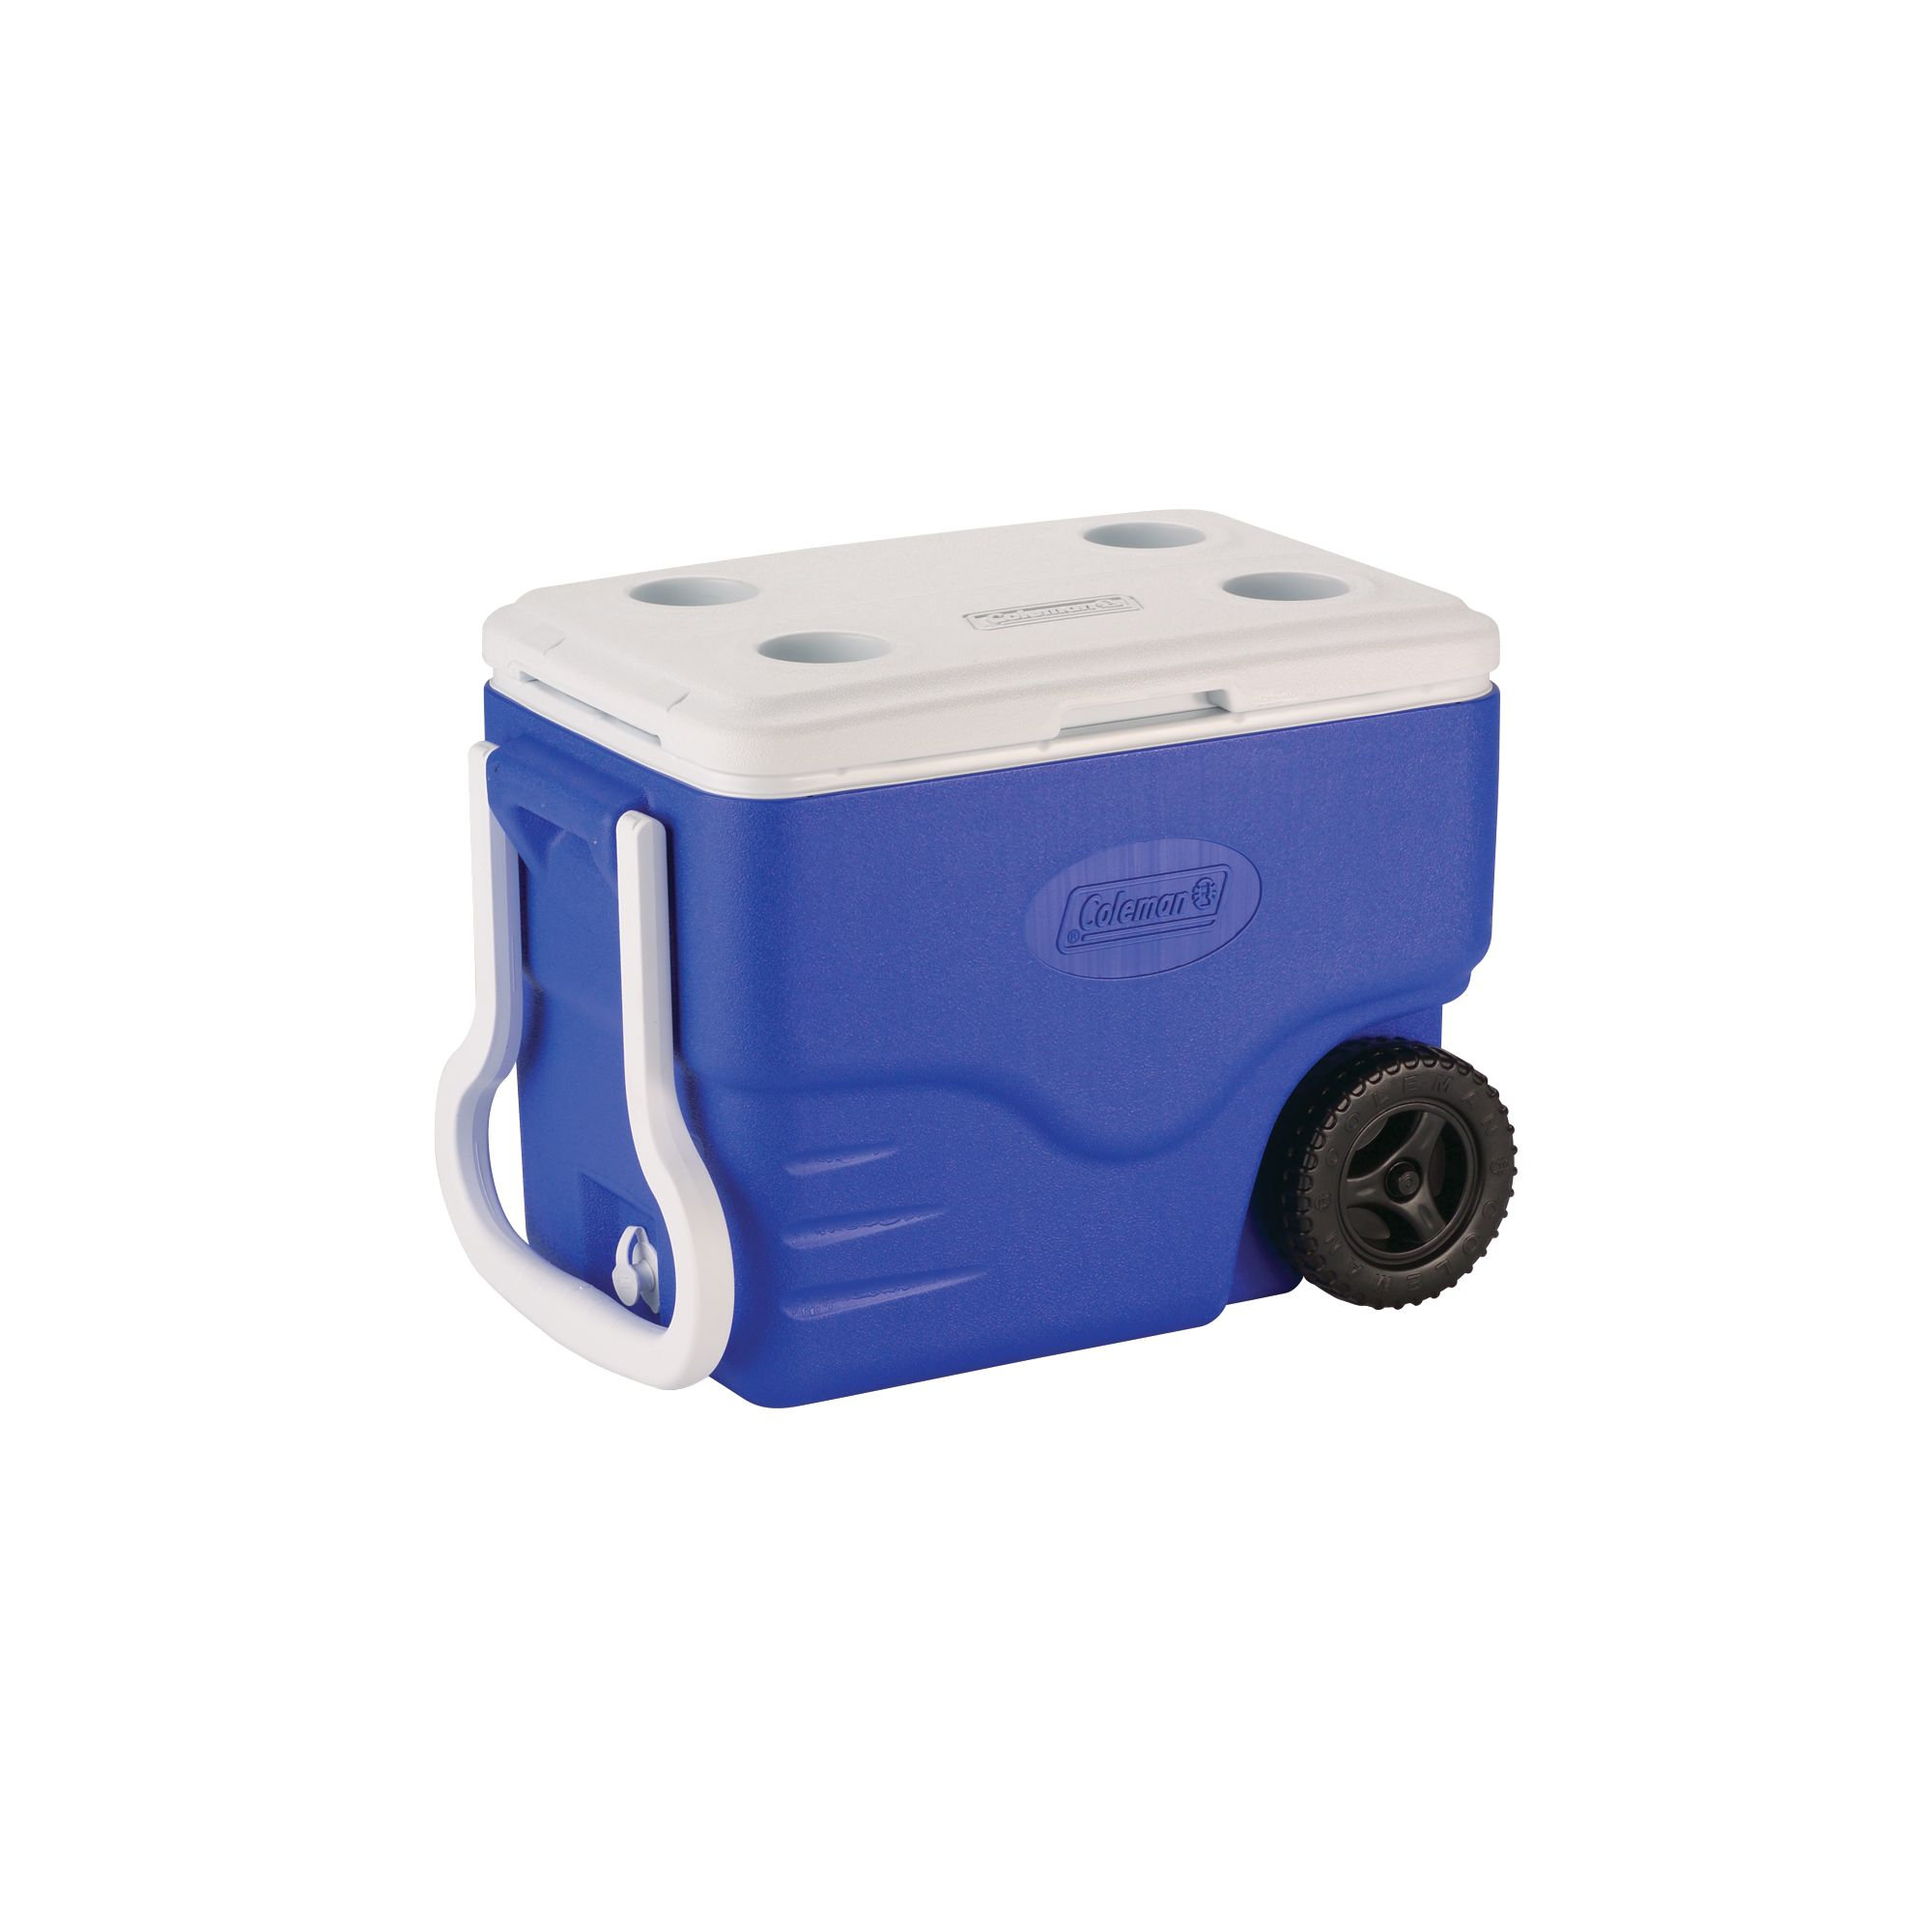 40 Quart Performance Wheeled Cooler | Coleman